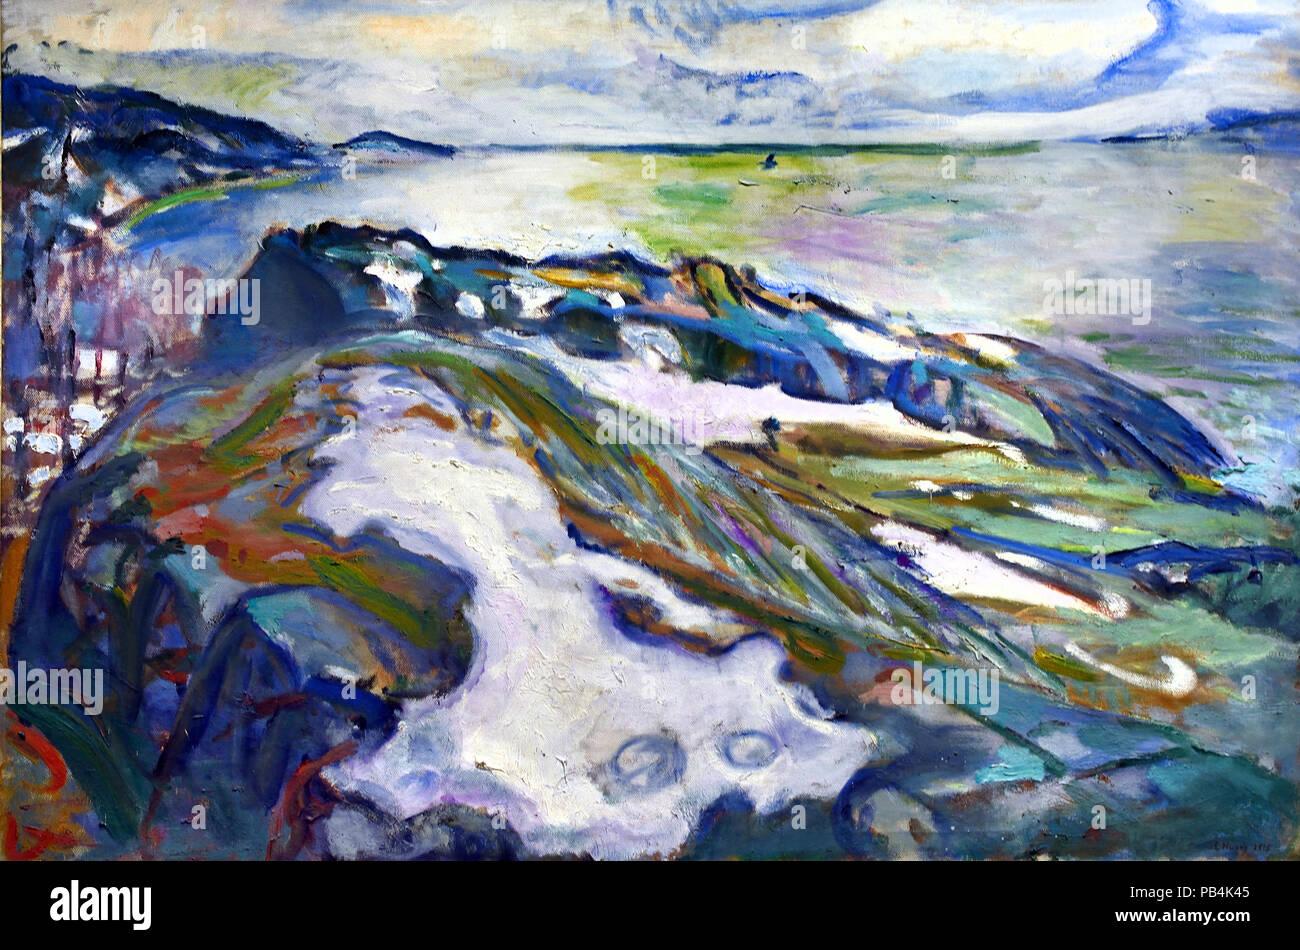 Winter Landscape 1915 Edvard Munch 1863-1944 Norway Norwegian - Stock Image